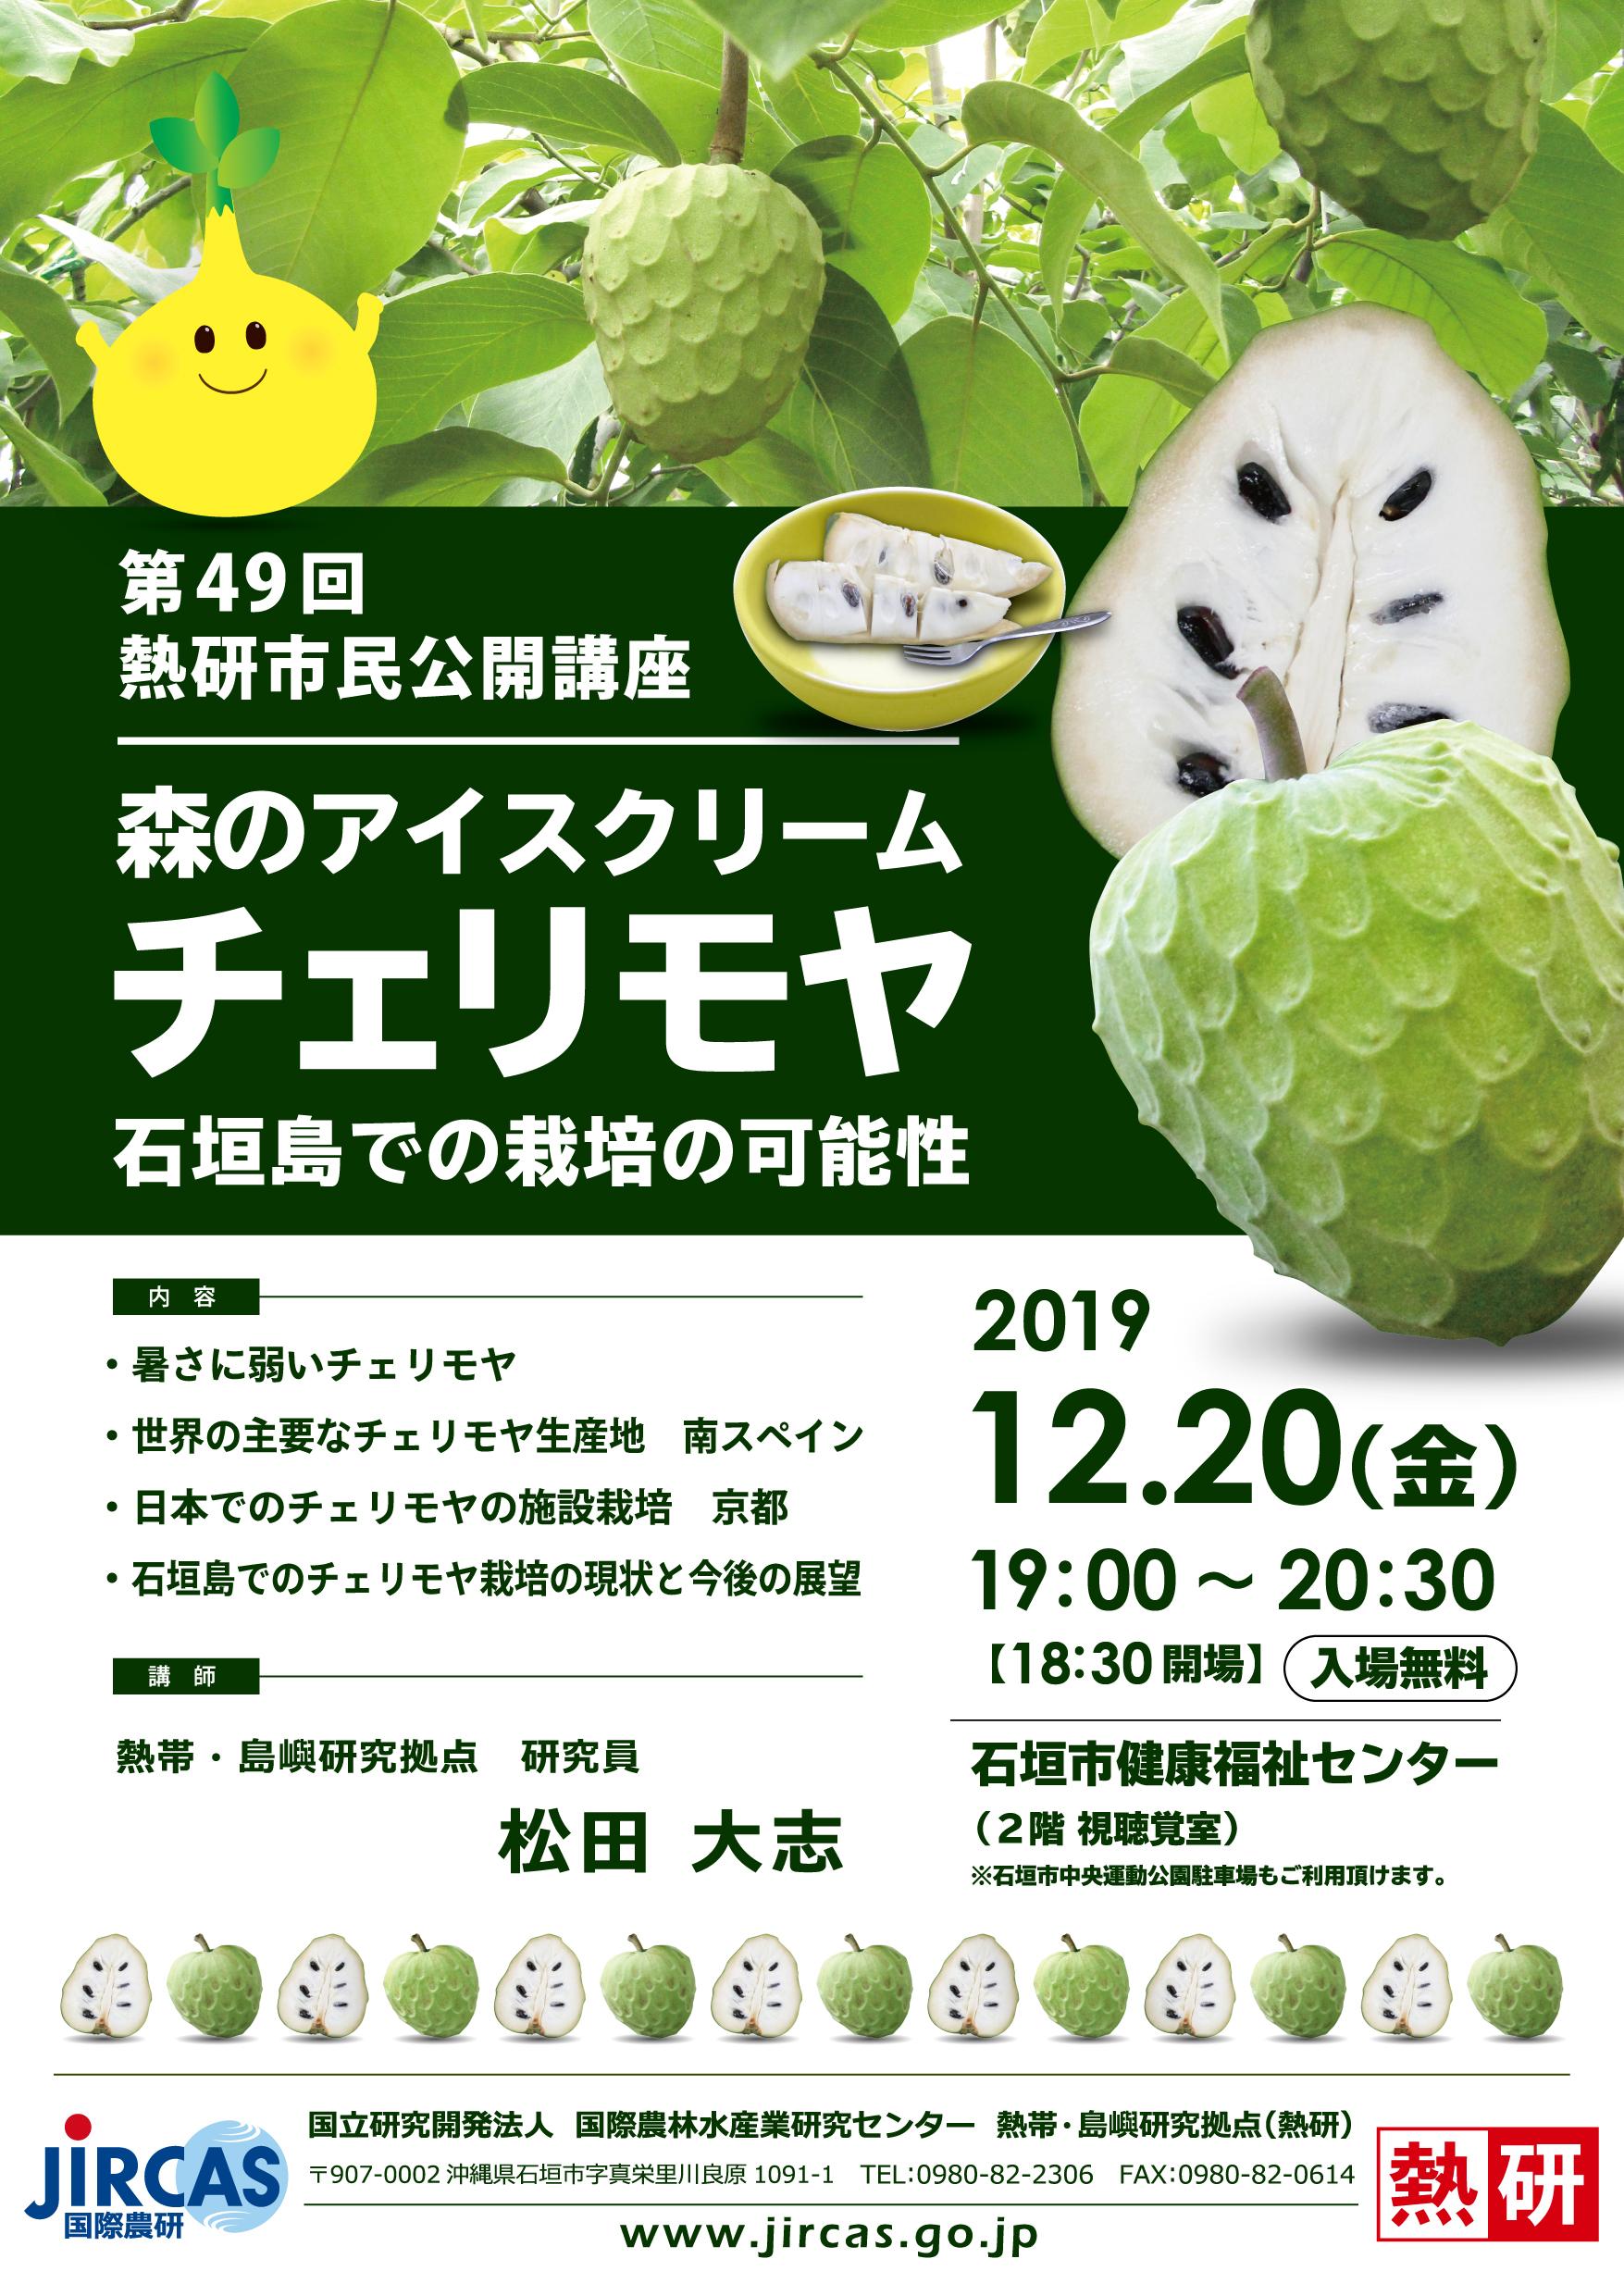 第49回熱研市民公開講座ポスター(20191205)